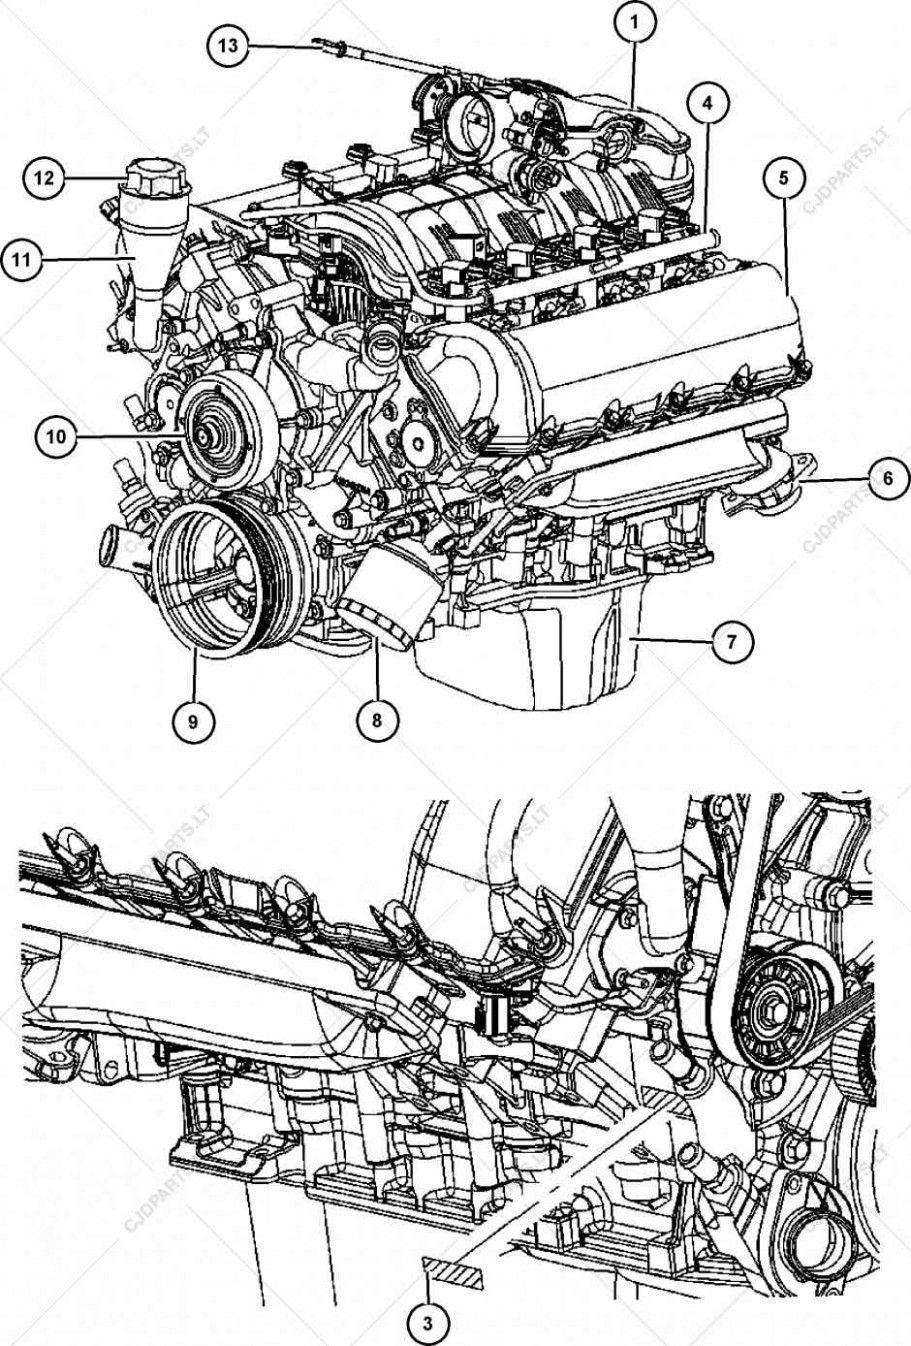 [DIAGRAM] 1989 Jeep Cherokee Engine Diagram